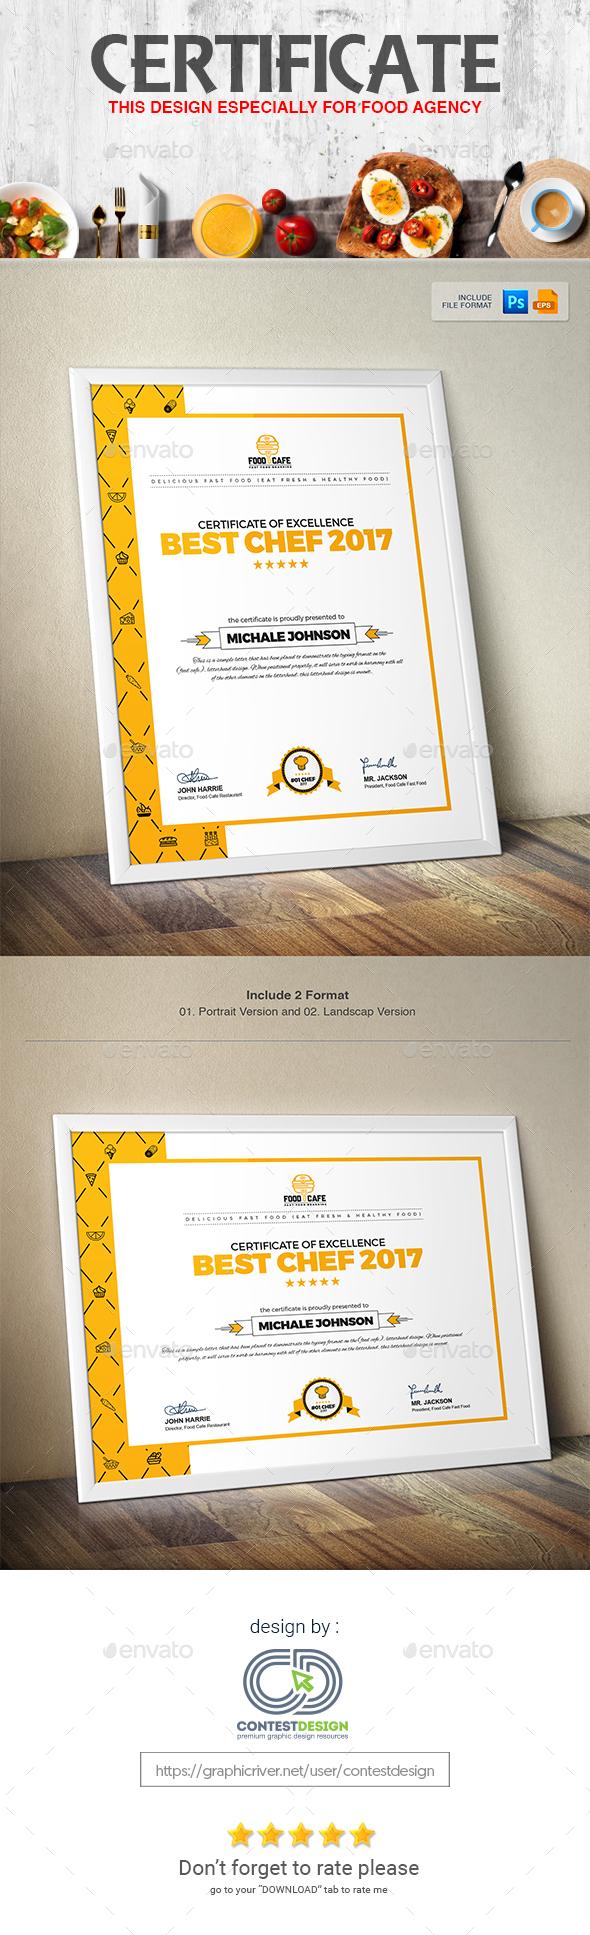 Certificate design template psd vector eps ai illustrator certificate design template psd vector eps ai illustrator yadclub Gallery